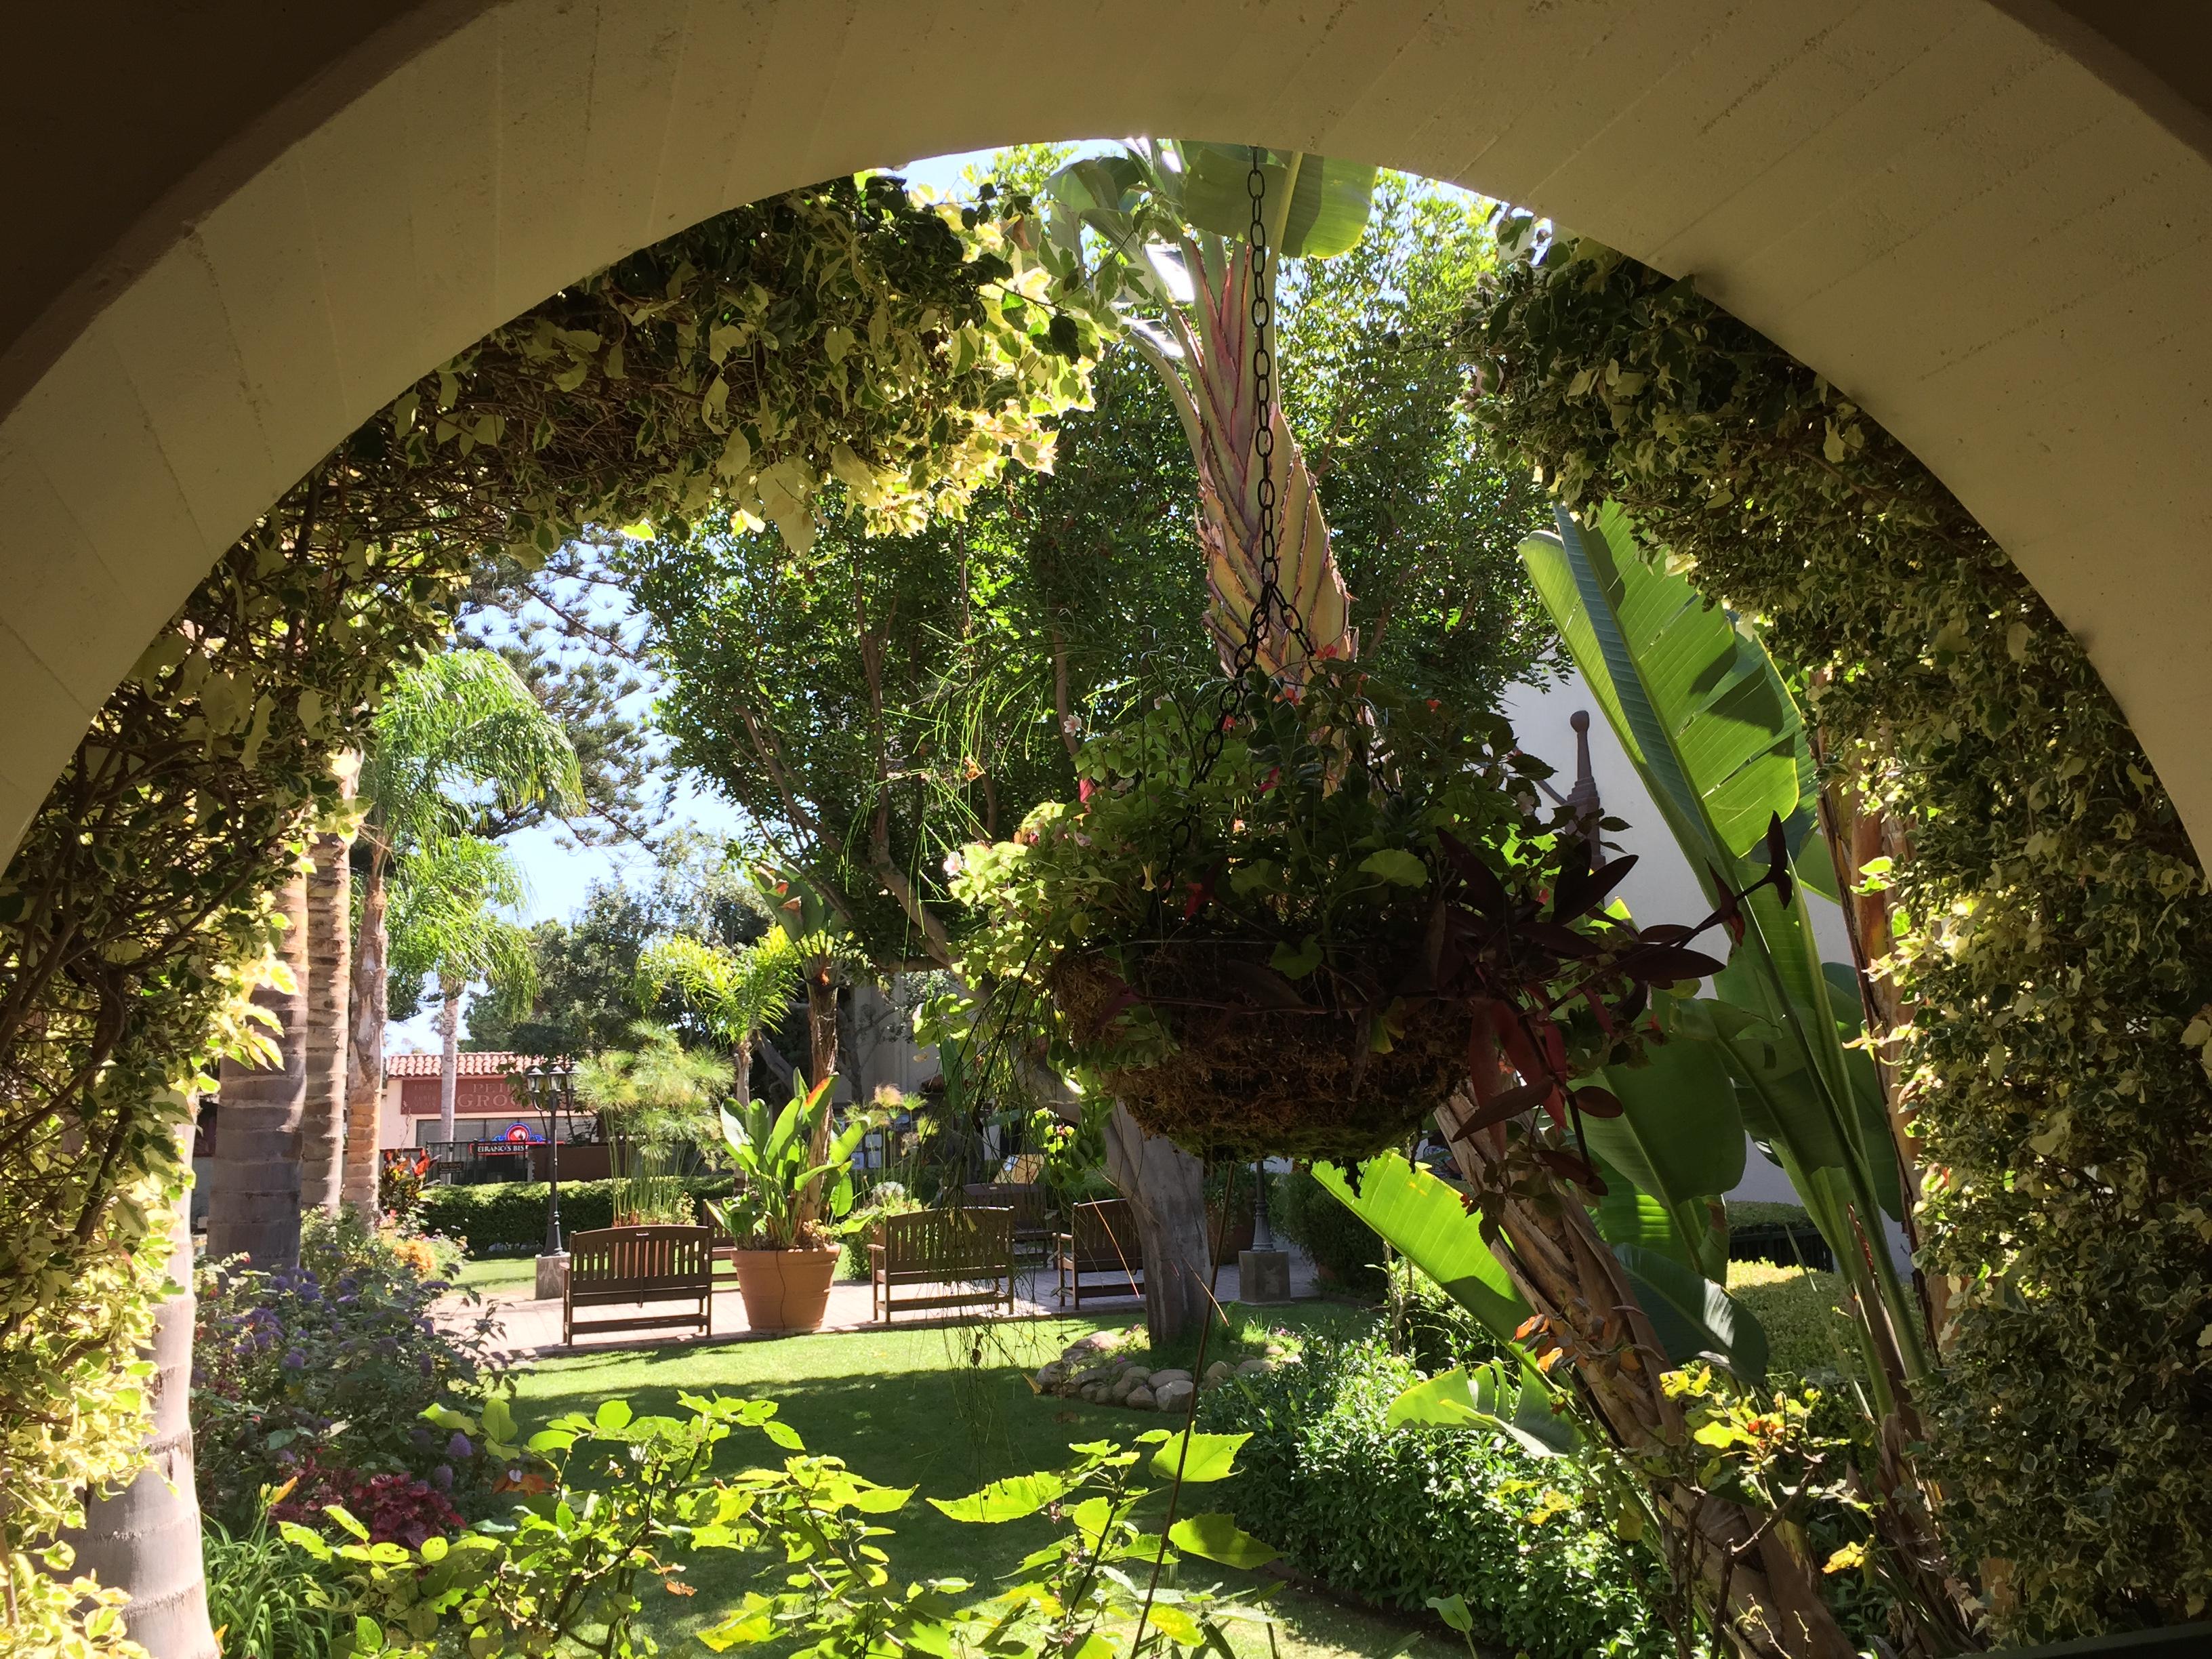 Ventura mission patio - ventura santa Barbara san Fernando Missions